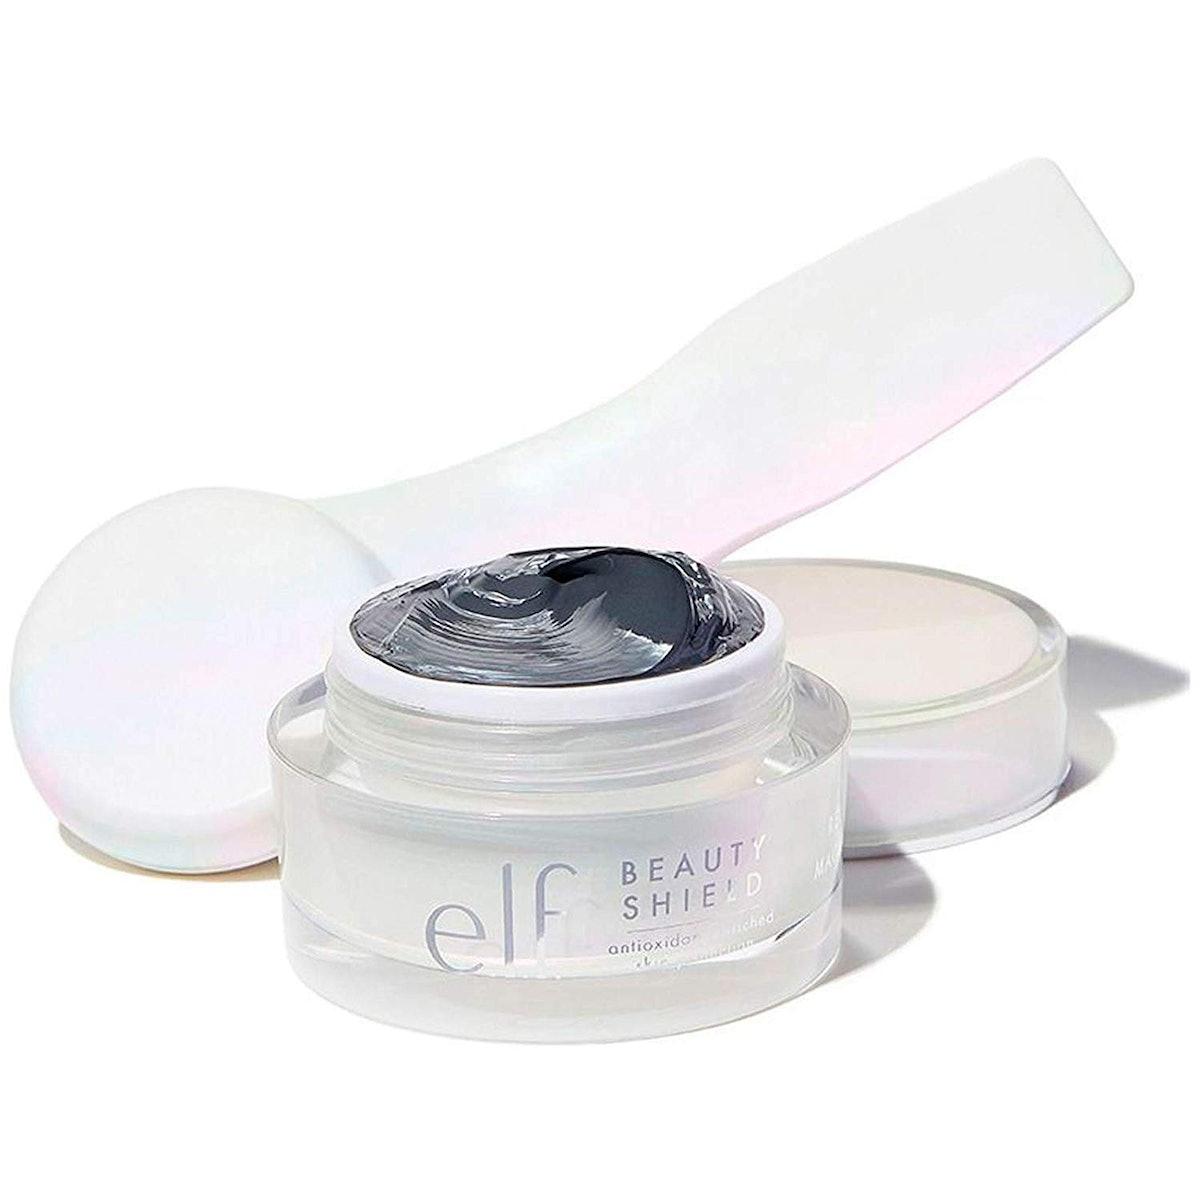 e.l.f Beauty Shield Magnetic Mask Kit